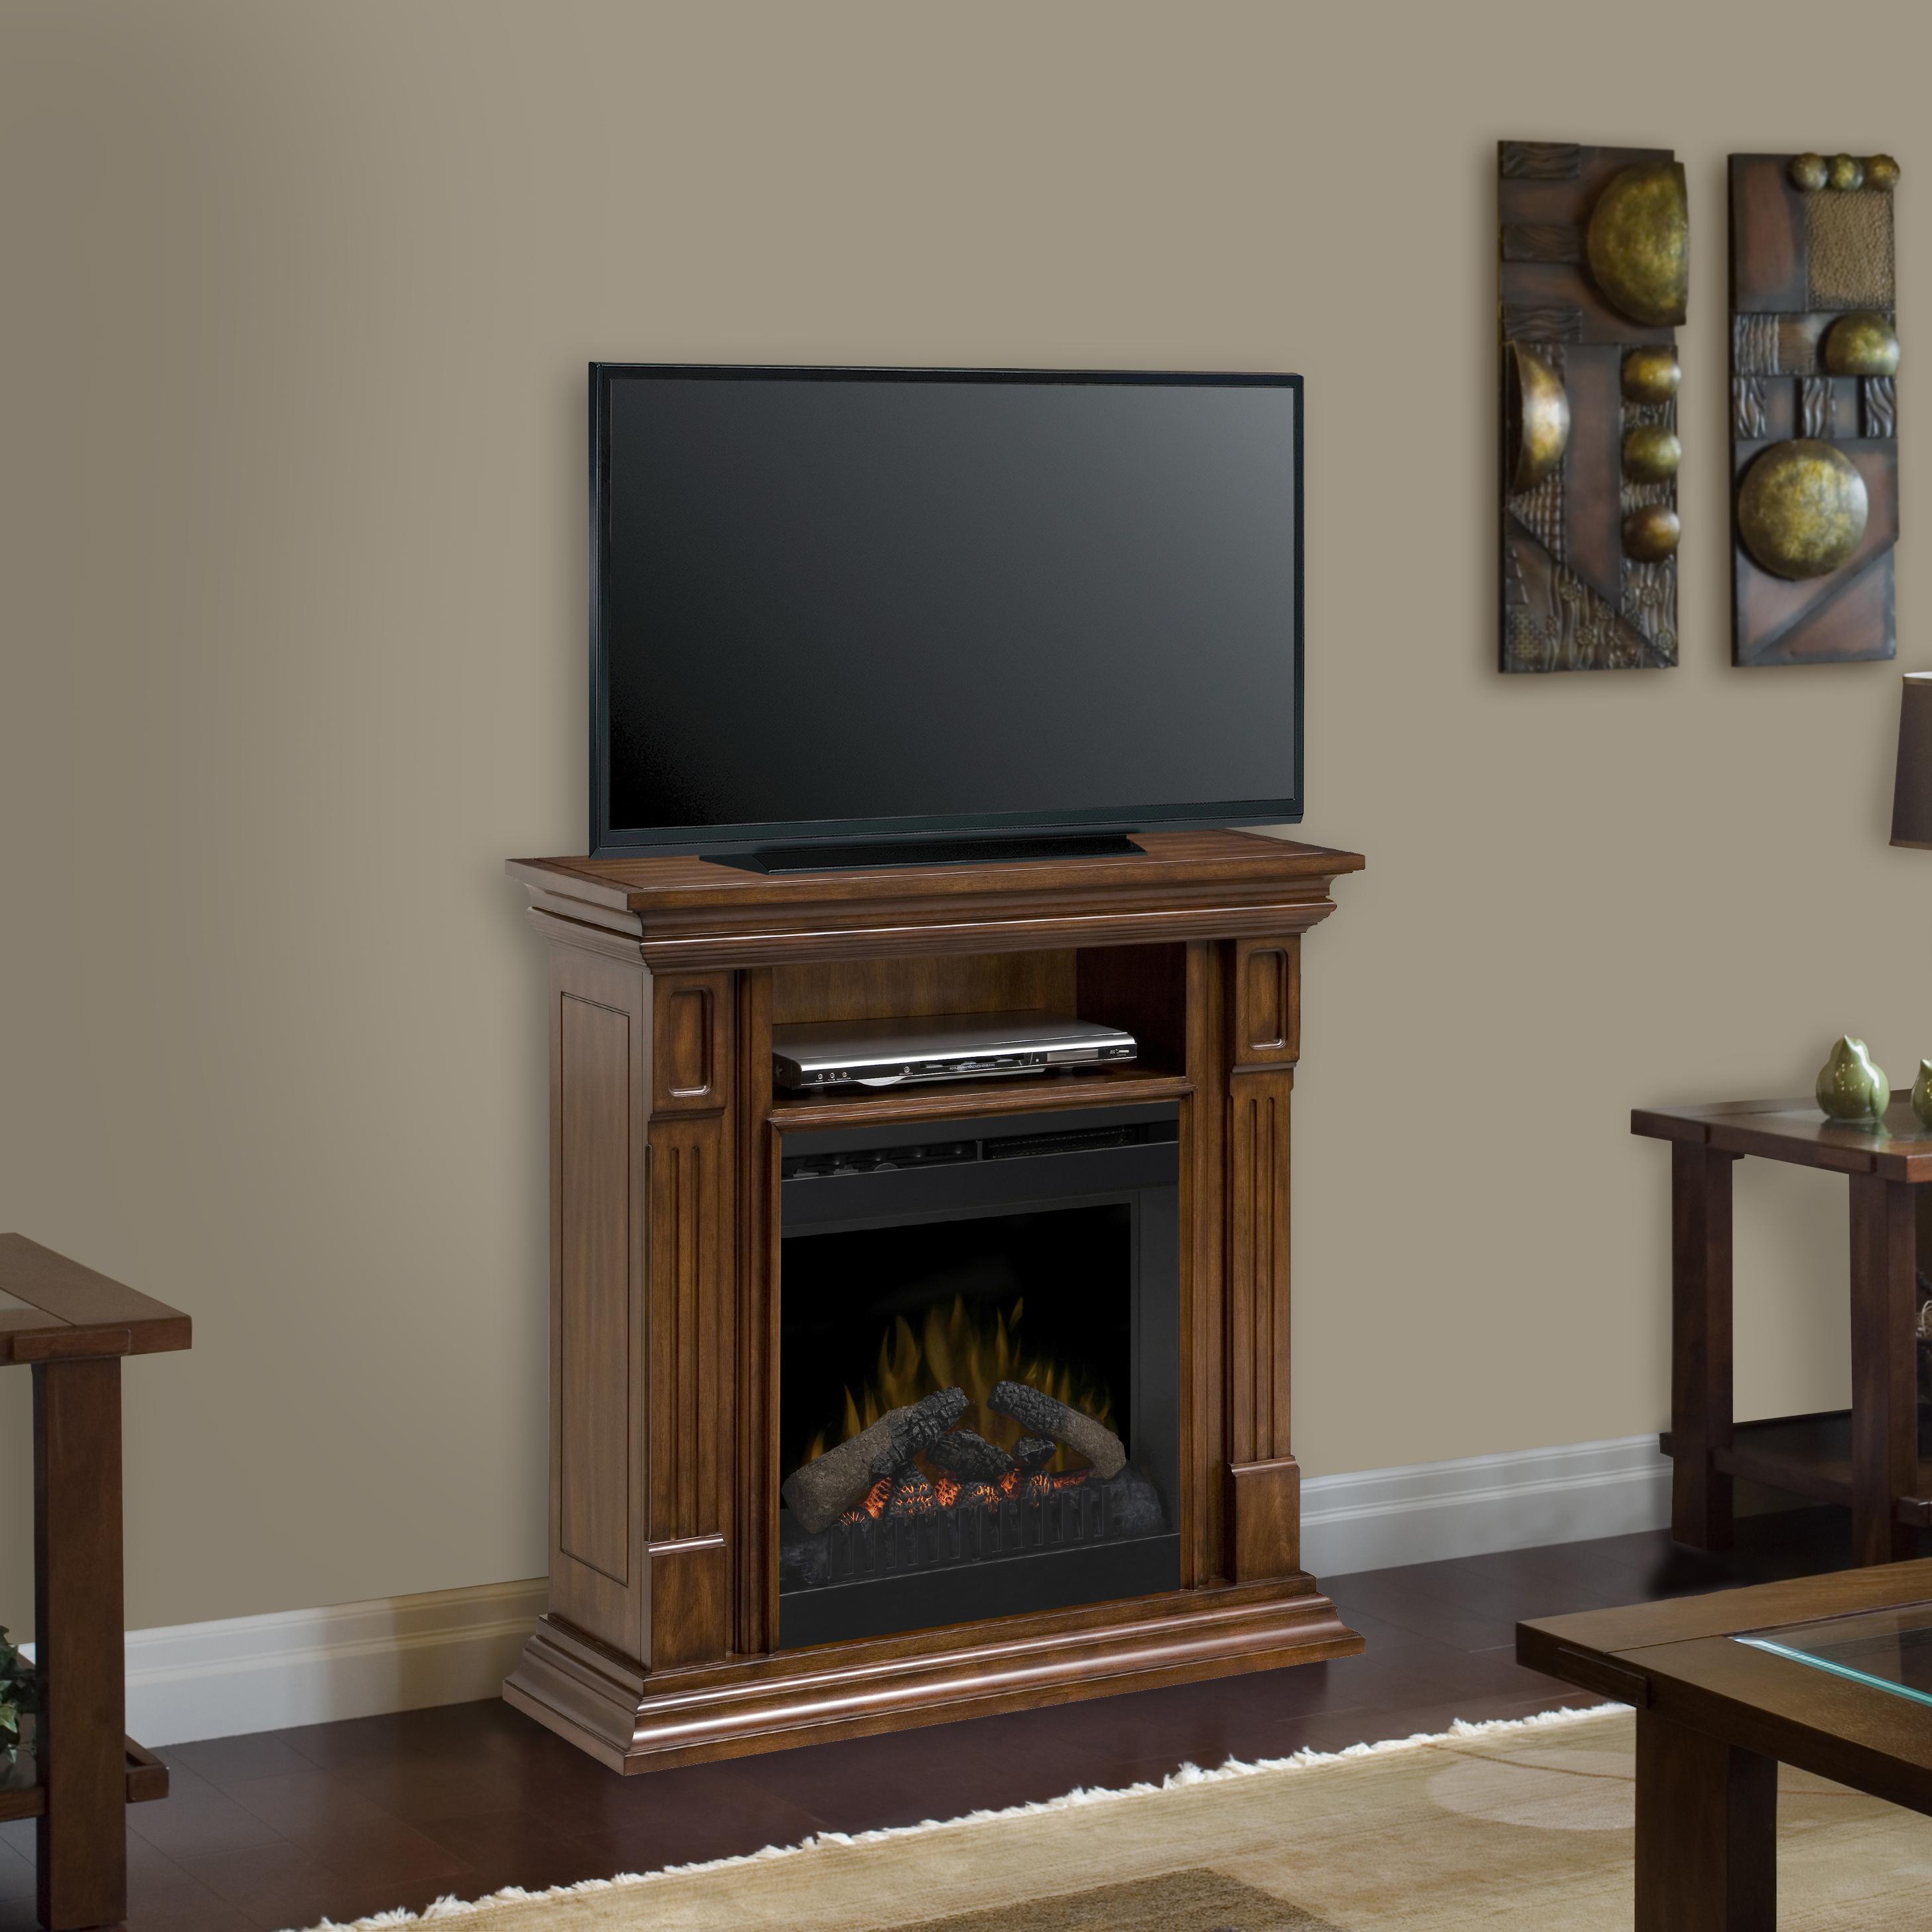 Deerhurst Electric Firepalce media console by DIMPLEX